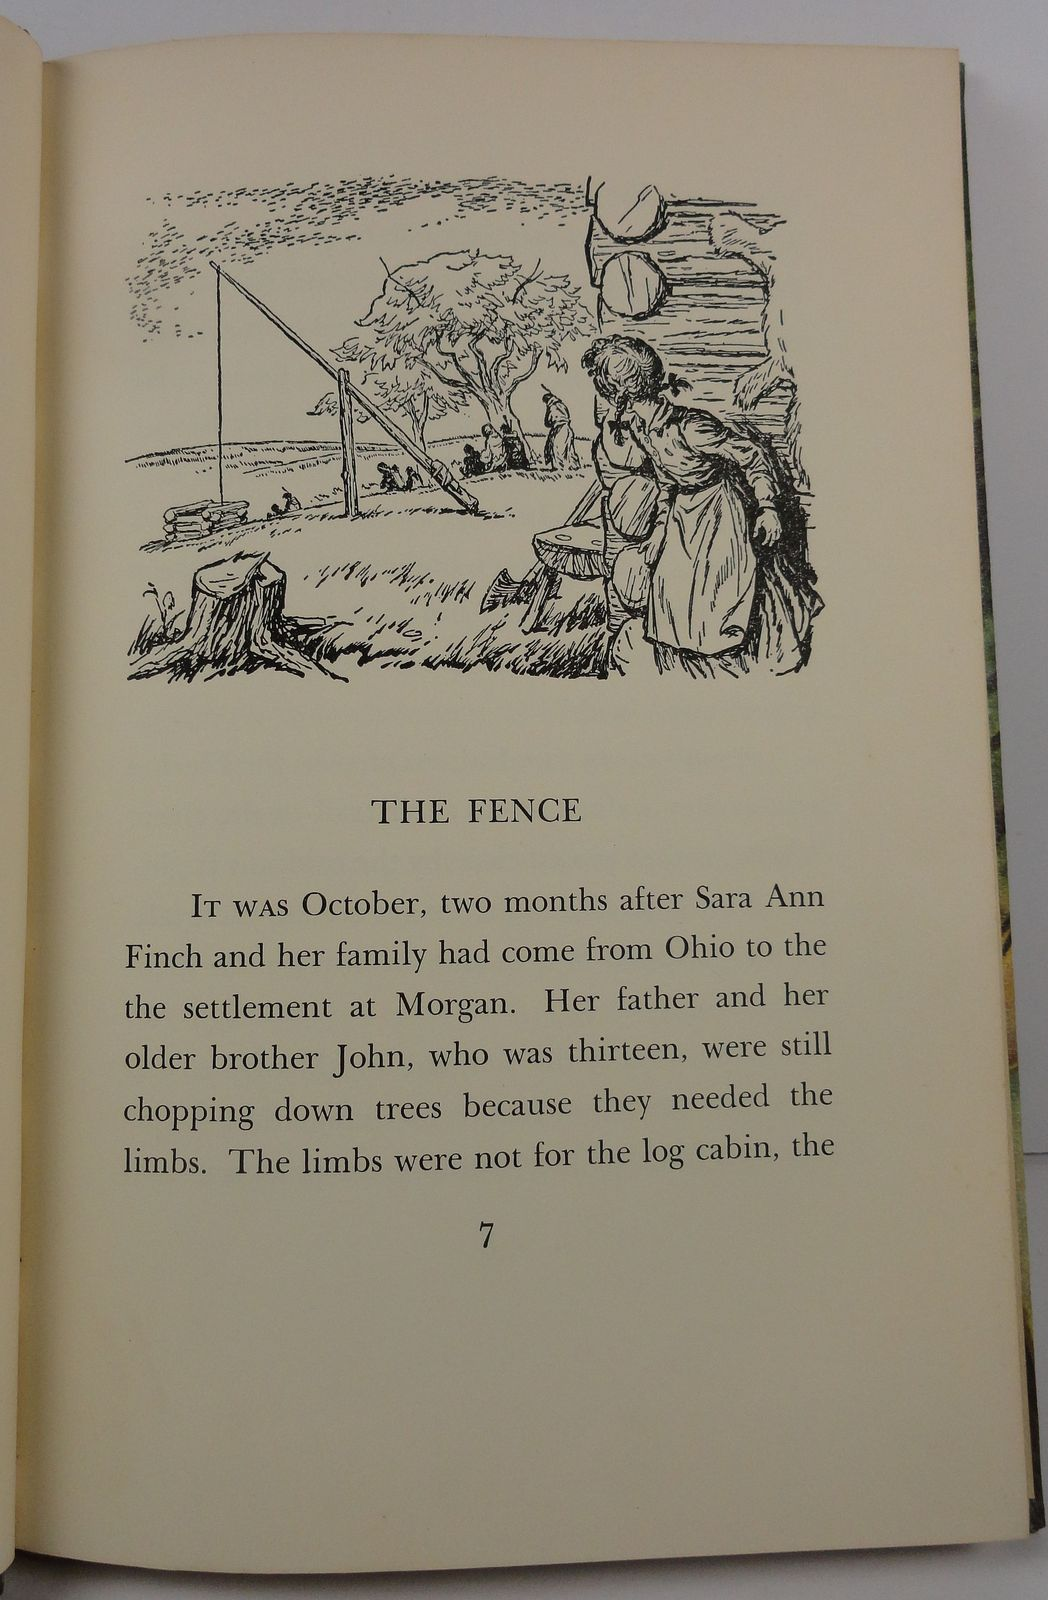 Fence Across the Trail by Elsa Falk 1957 Follett